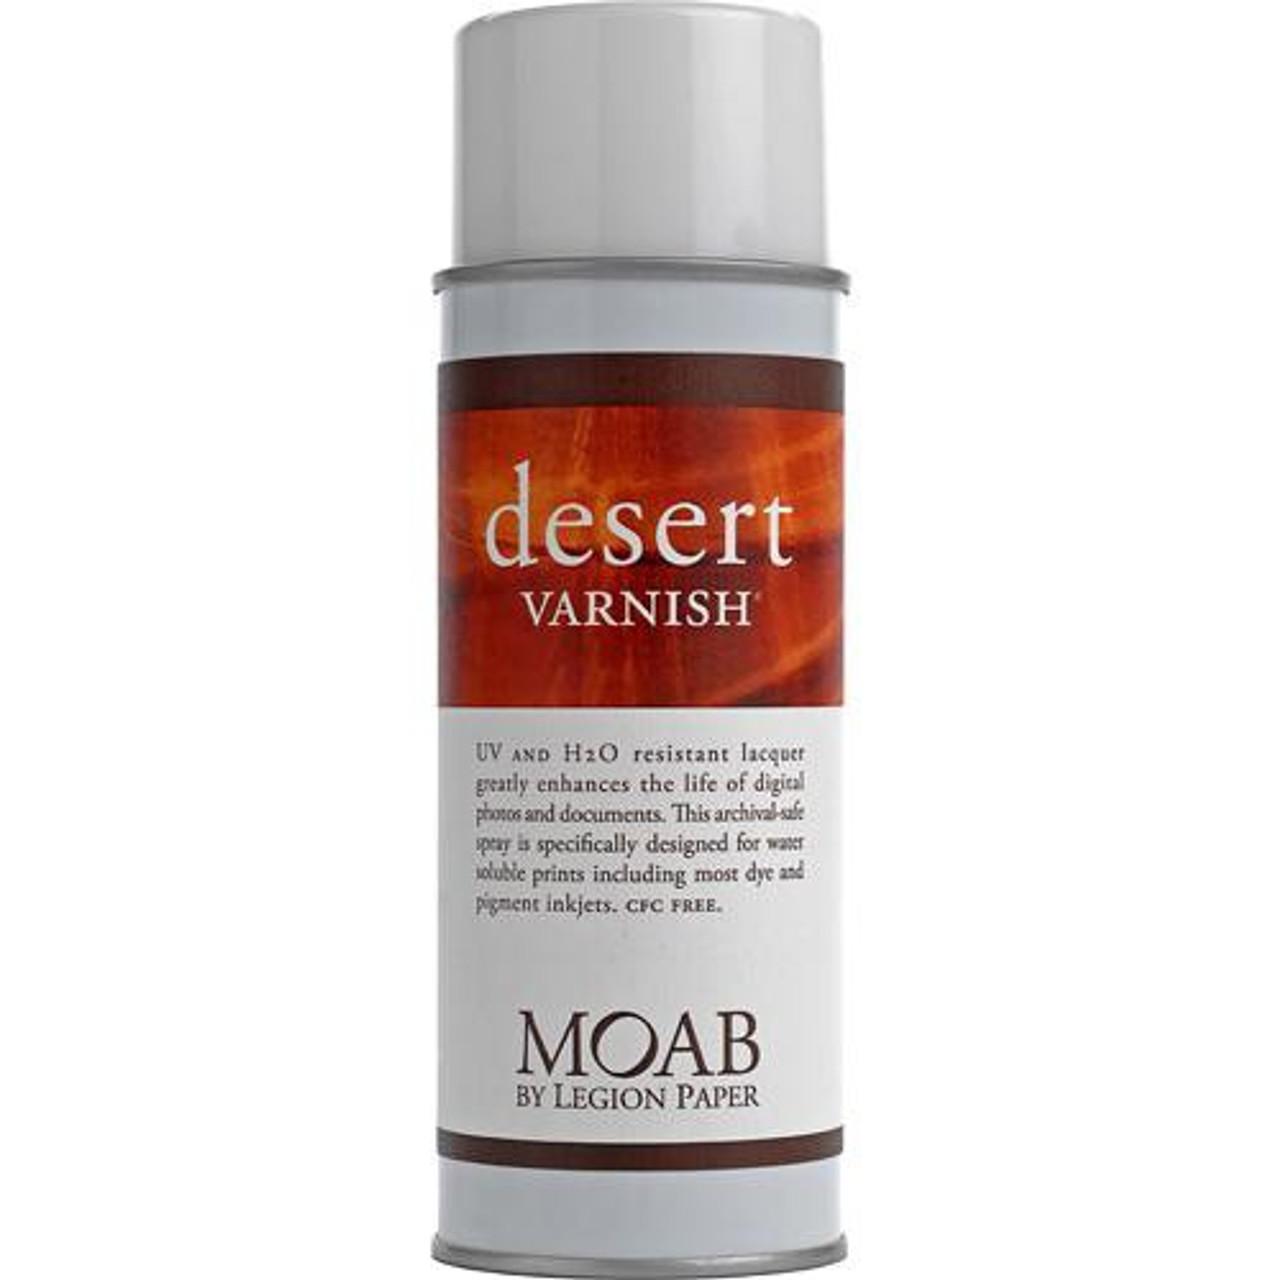 MOAB DESERT VARNISH SPRAY